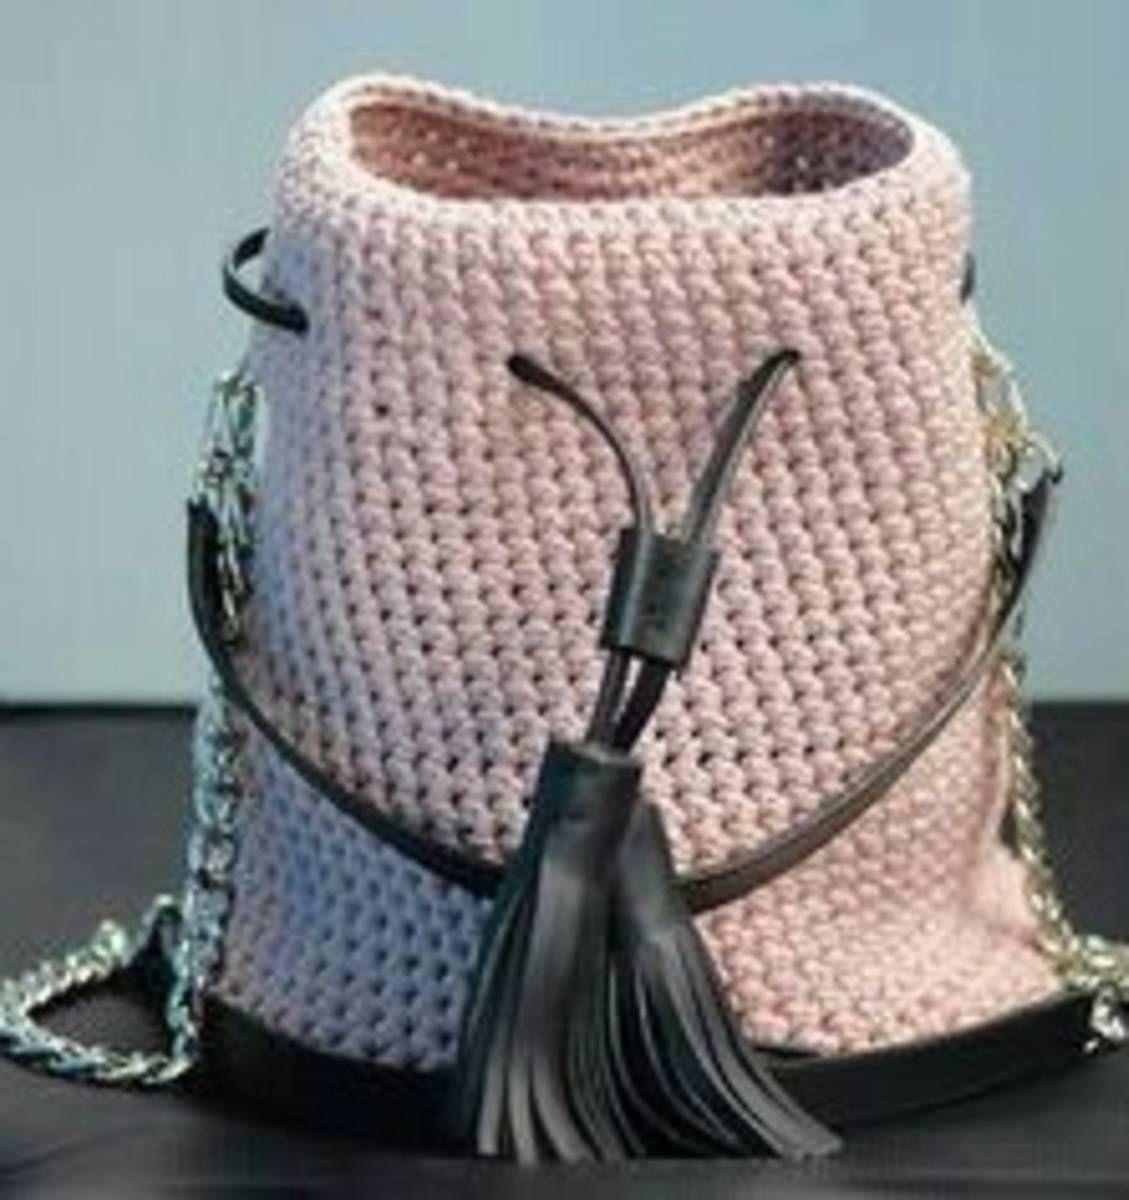 49b77cf58 bolsa saco em crochê sexy lady - ombro love-boho-shop